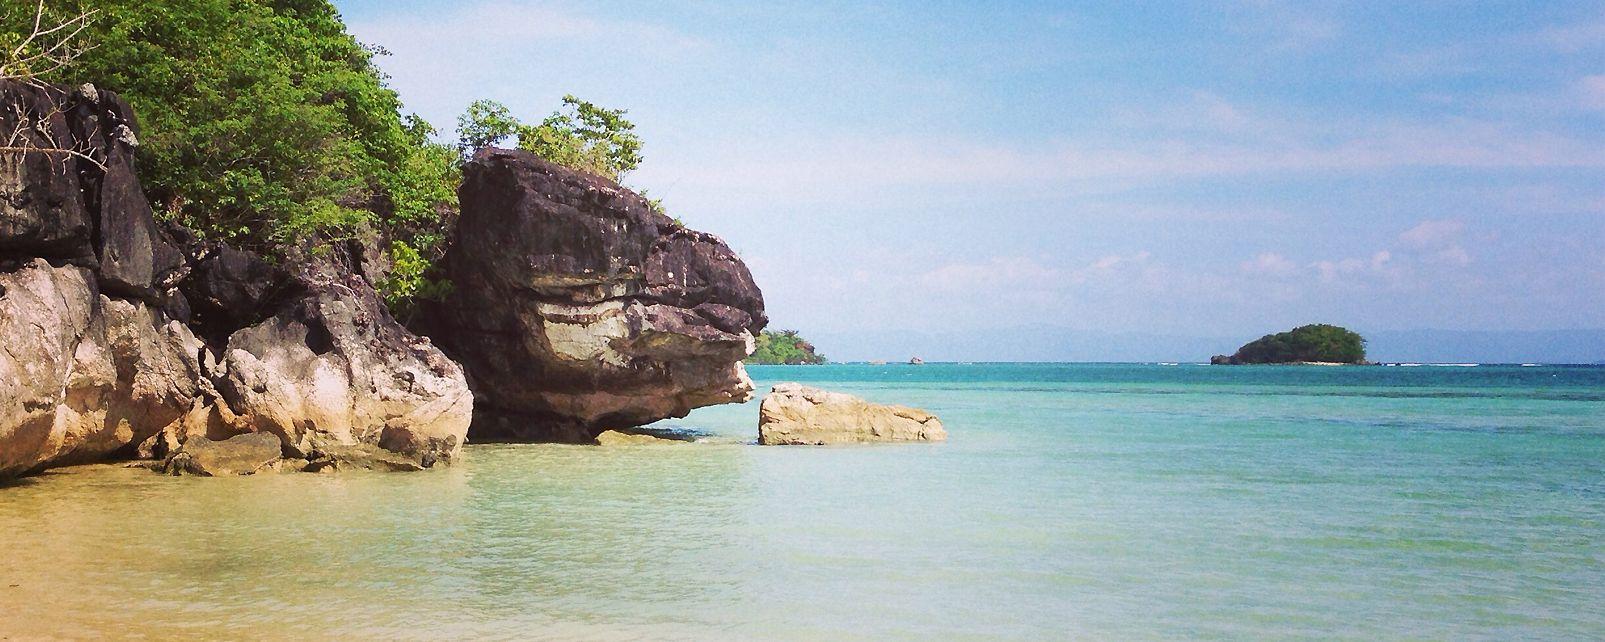 Les îles, caramoan, philippines, îles, asie, plage, mer